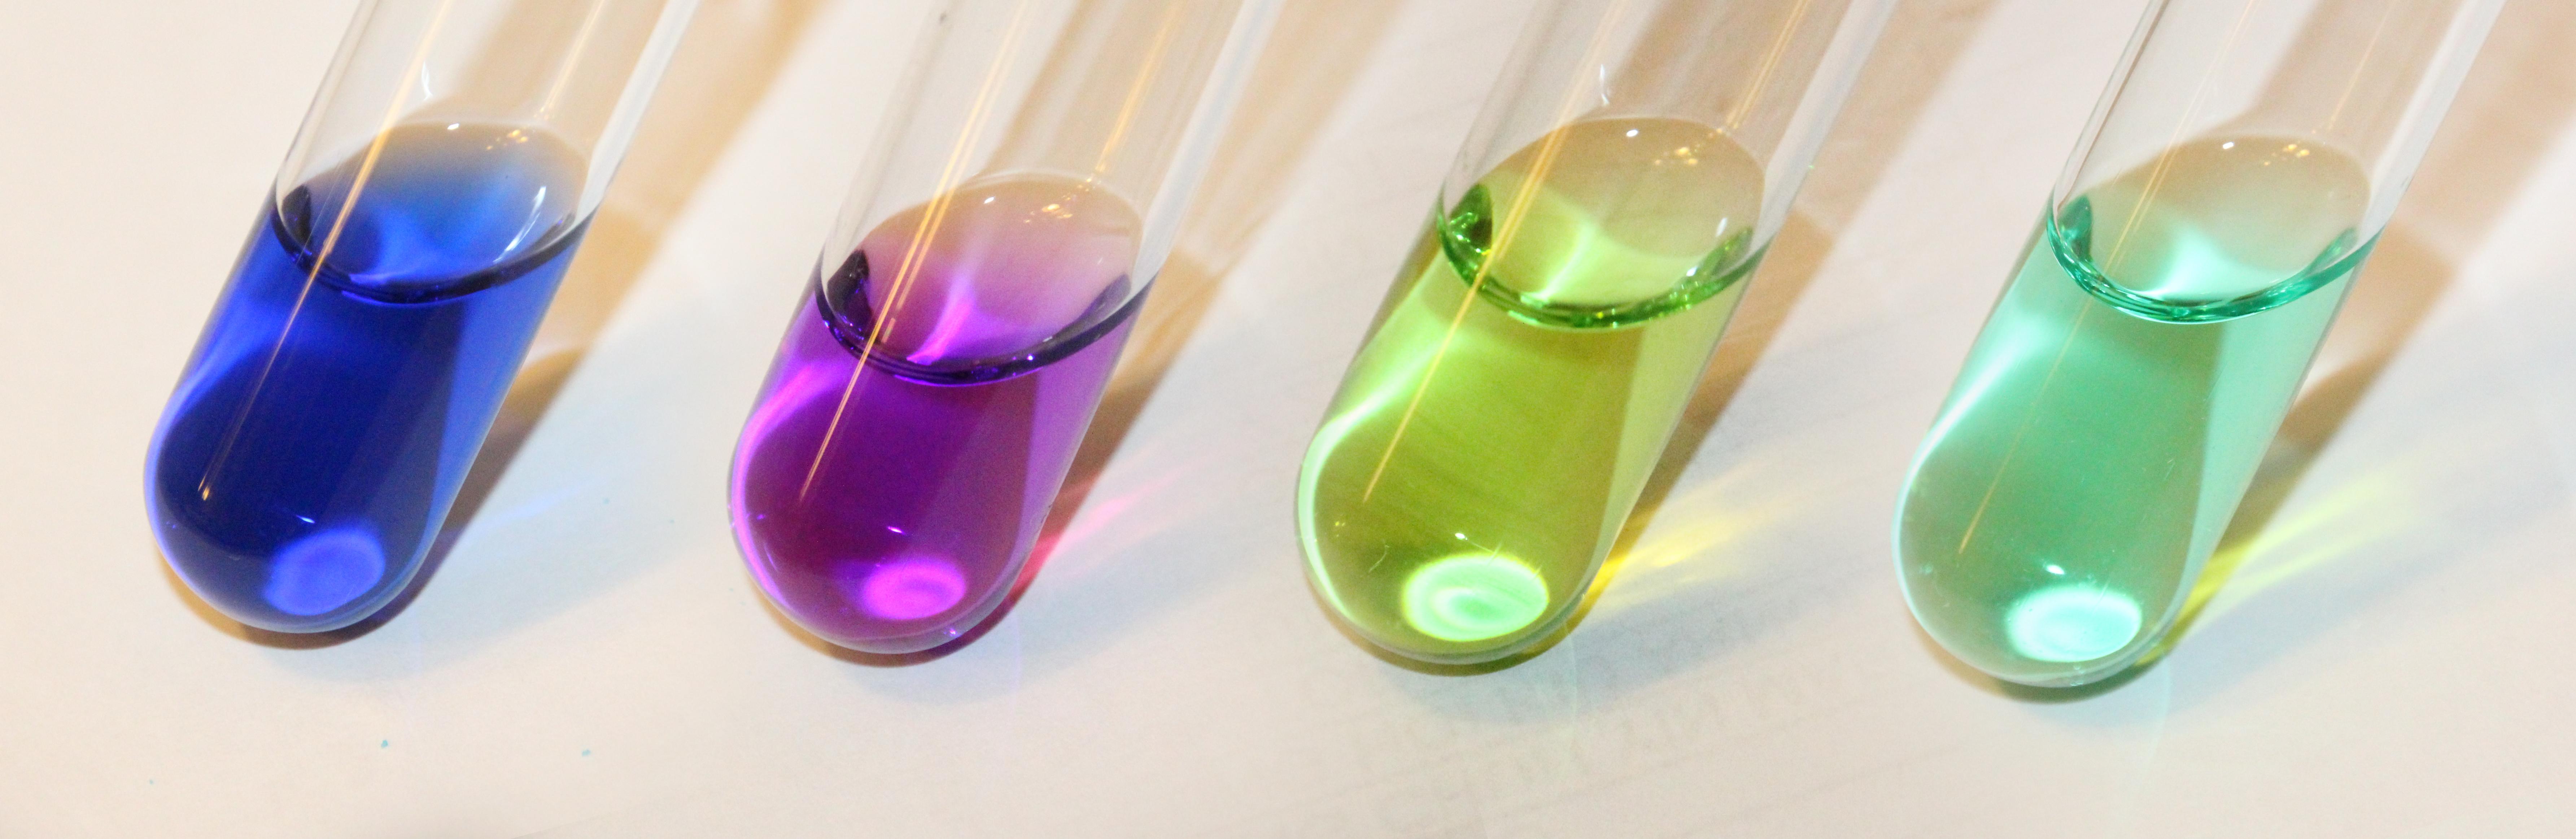 aqueous solutions Use of metallurgical dust for removal chromium ions from aqueous solutions  magdalena pająk, agnieszka dzieniszewska, joanna kyzioł-komosińska and.